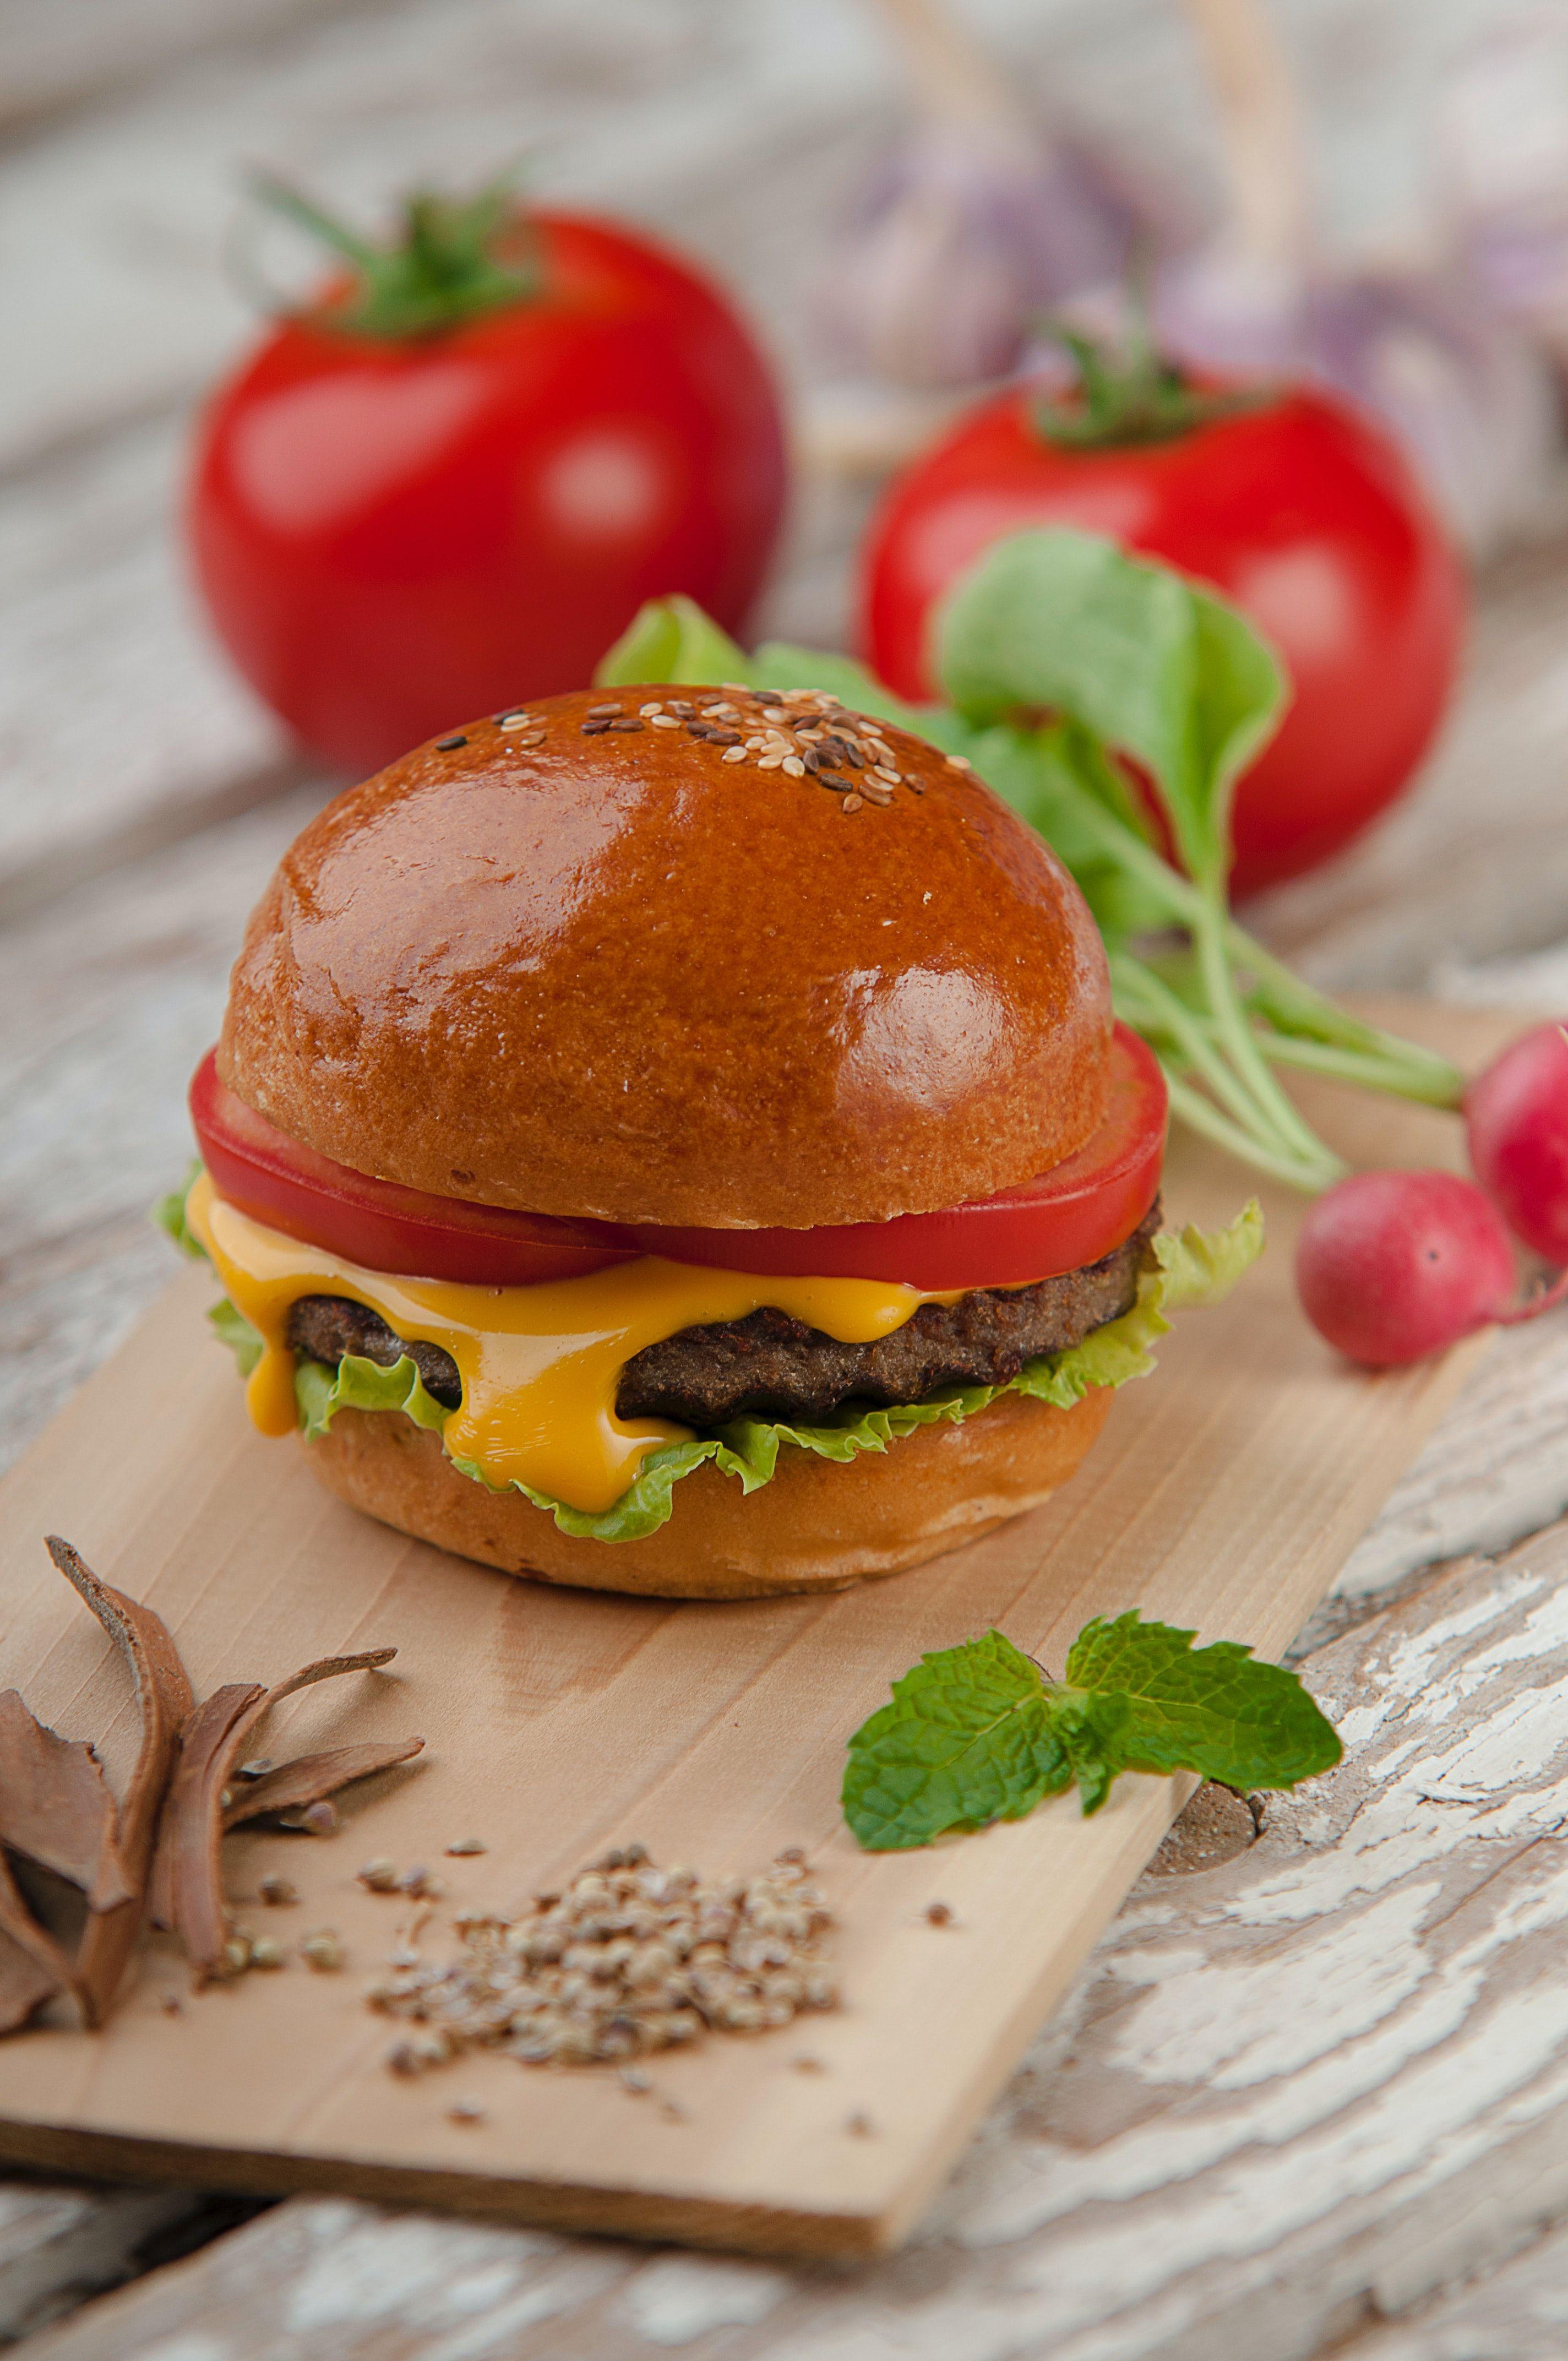 Burger_alireza-etemadi-ochmcvowrau-unsplash